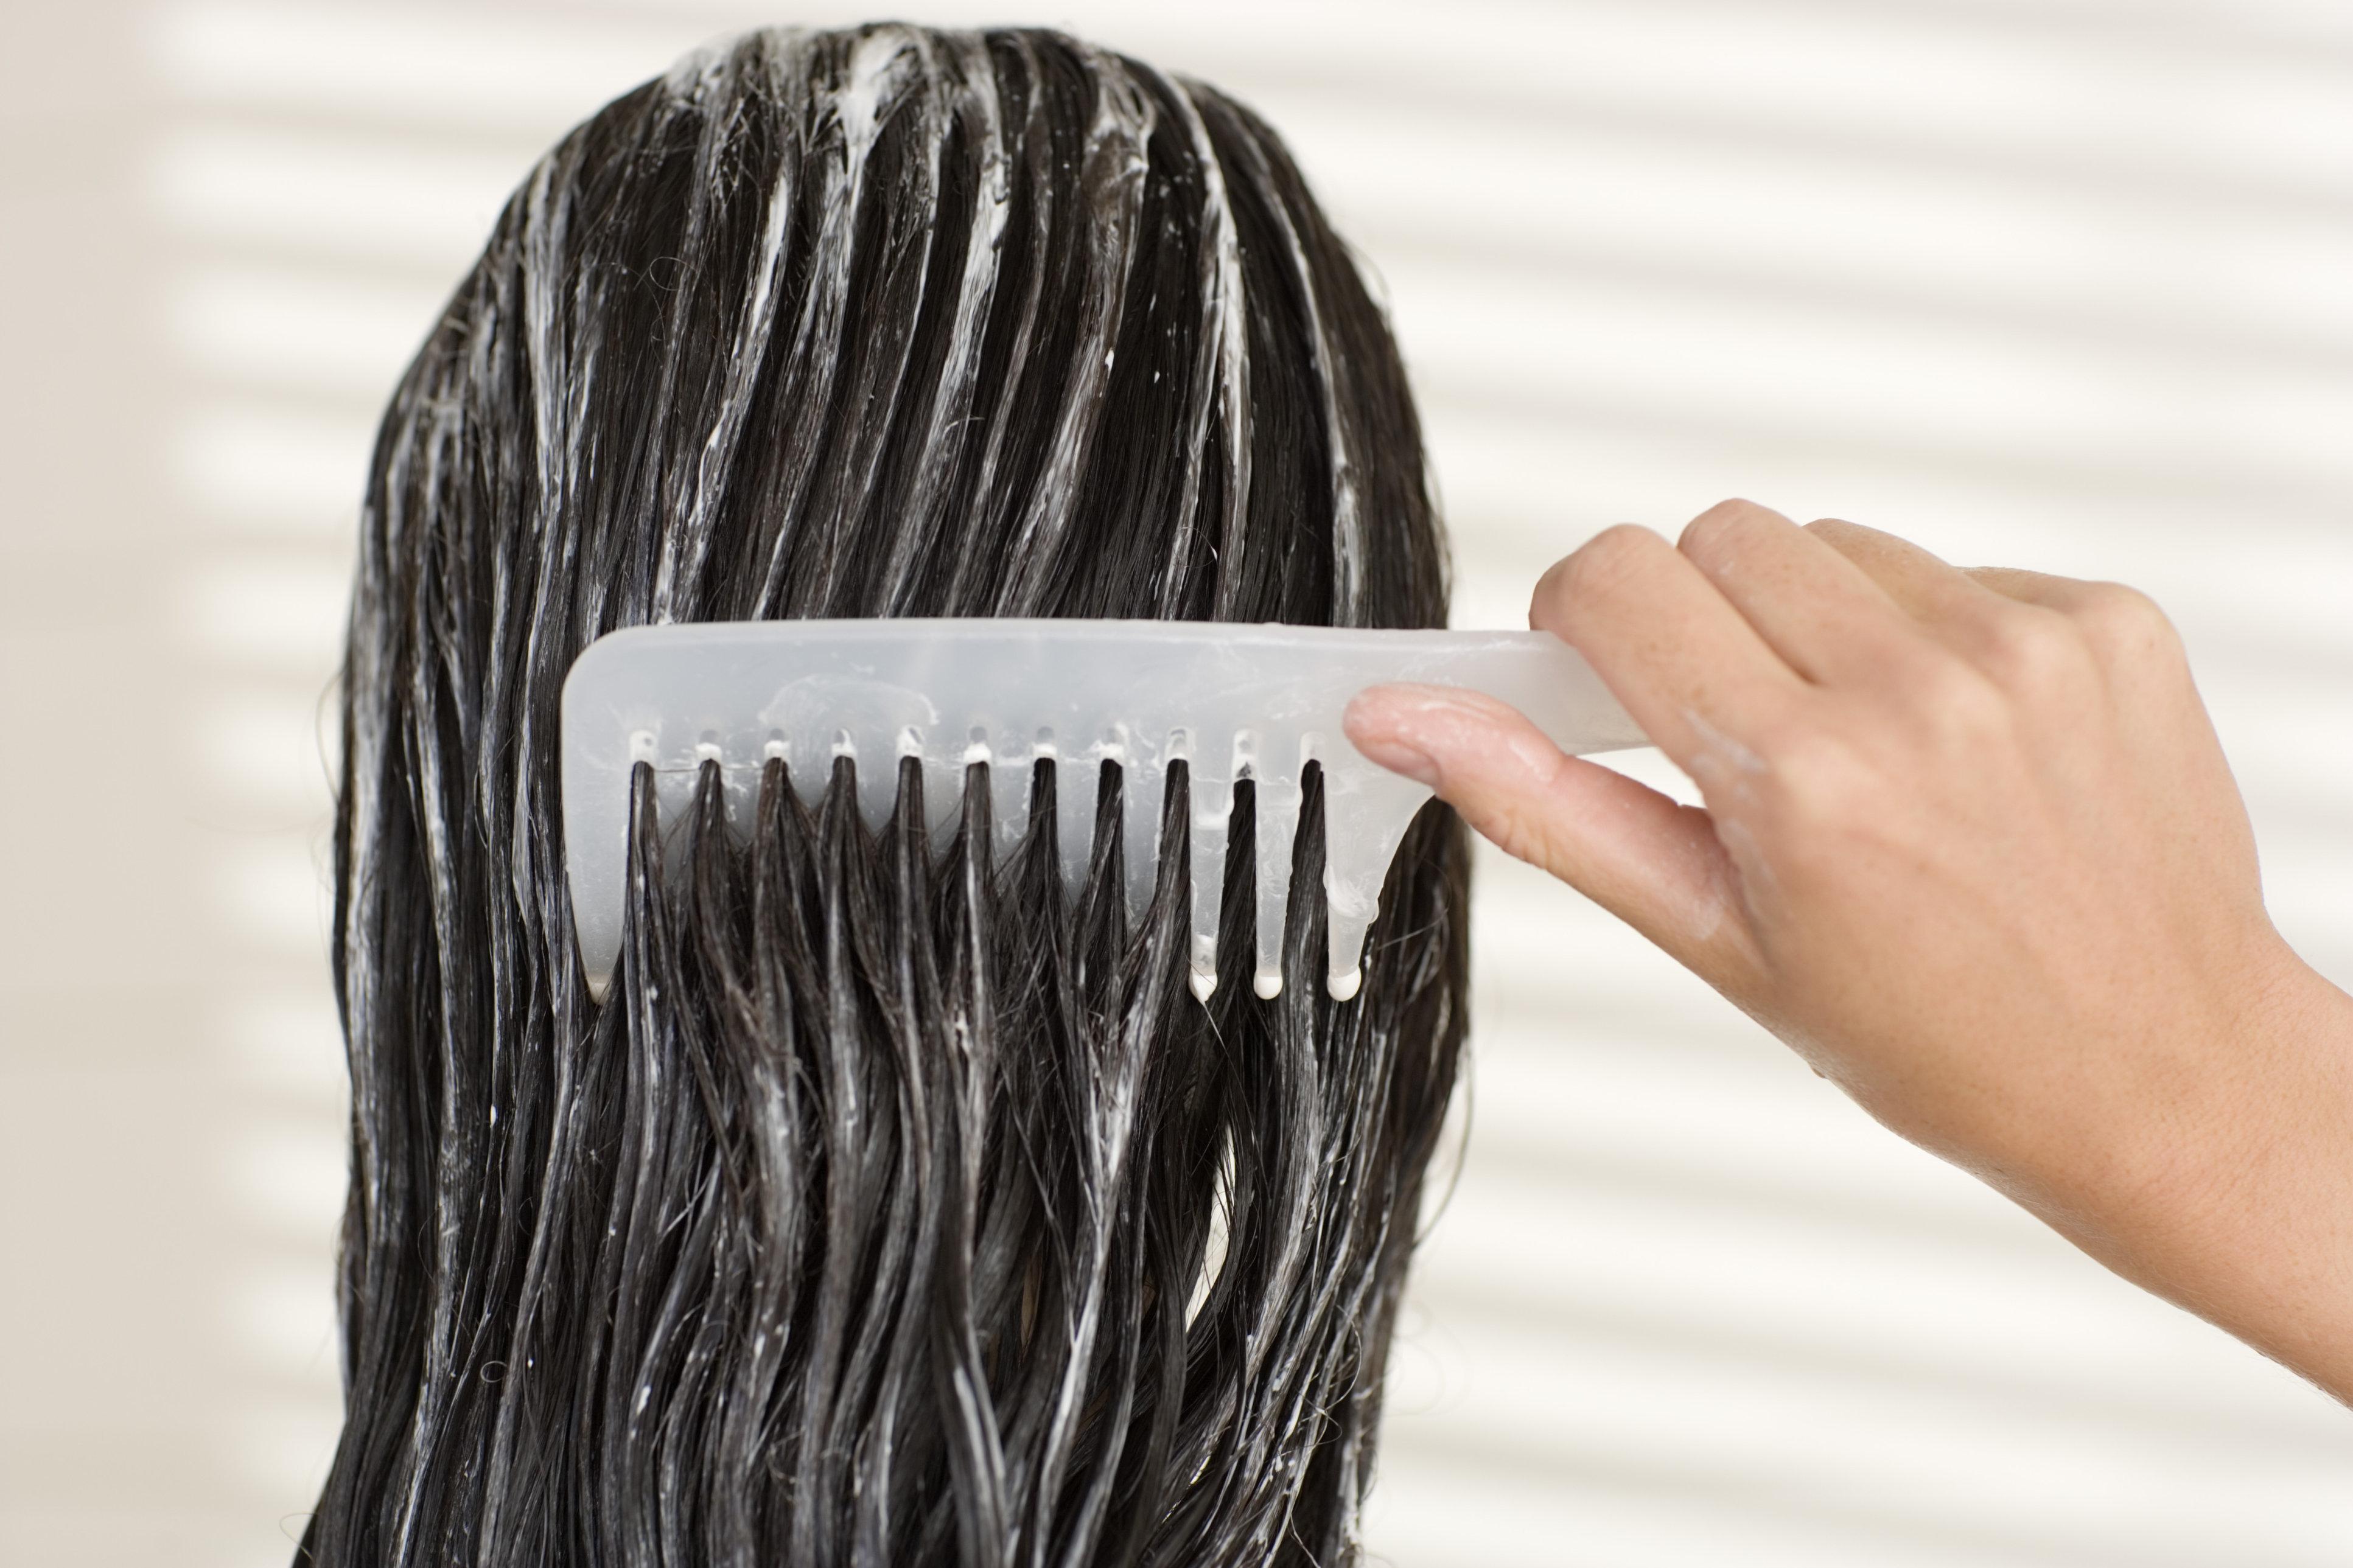 conditioner before shampoo的圖片搜尋結果